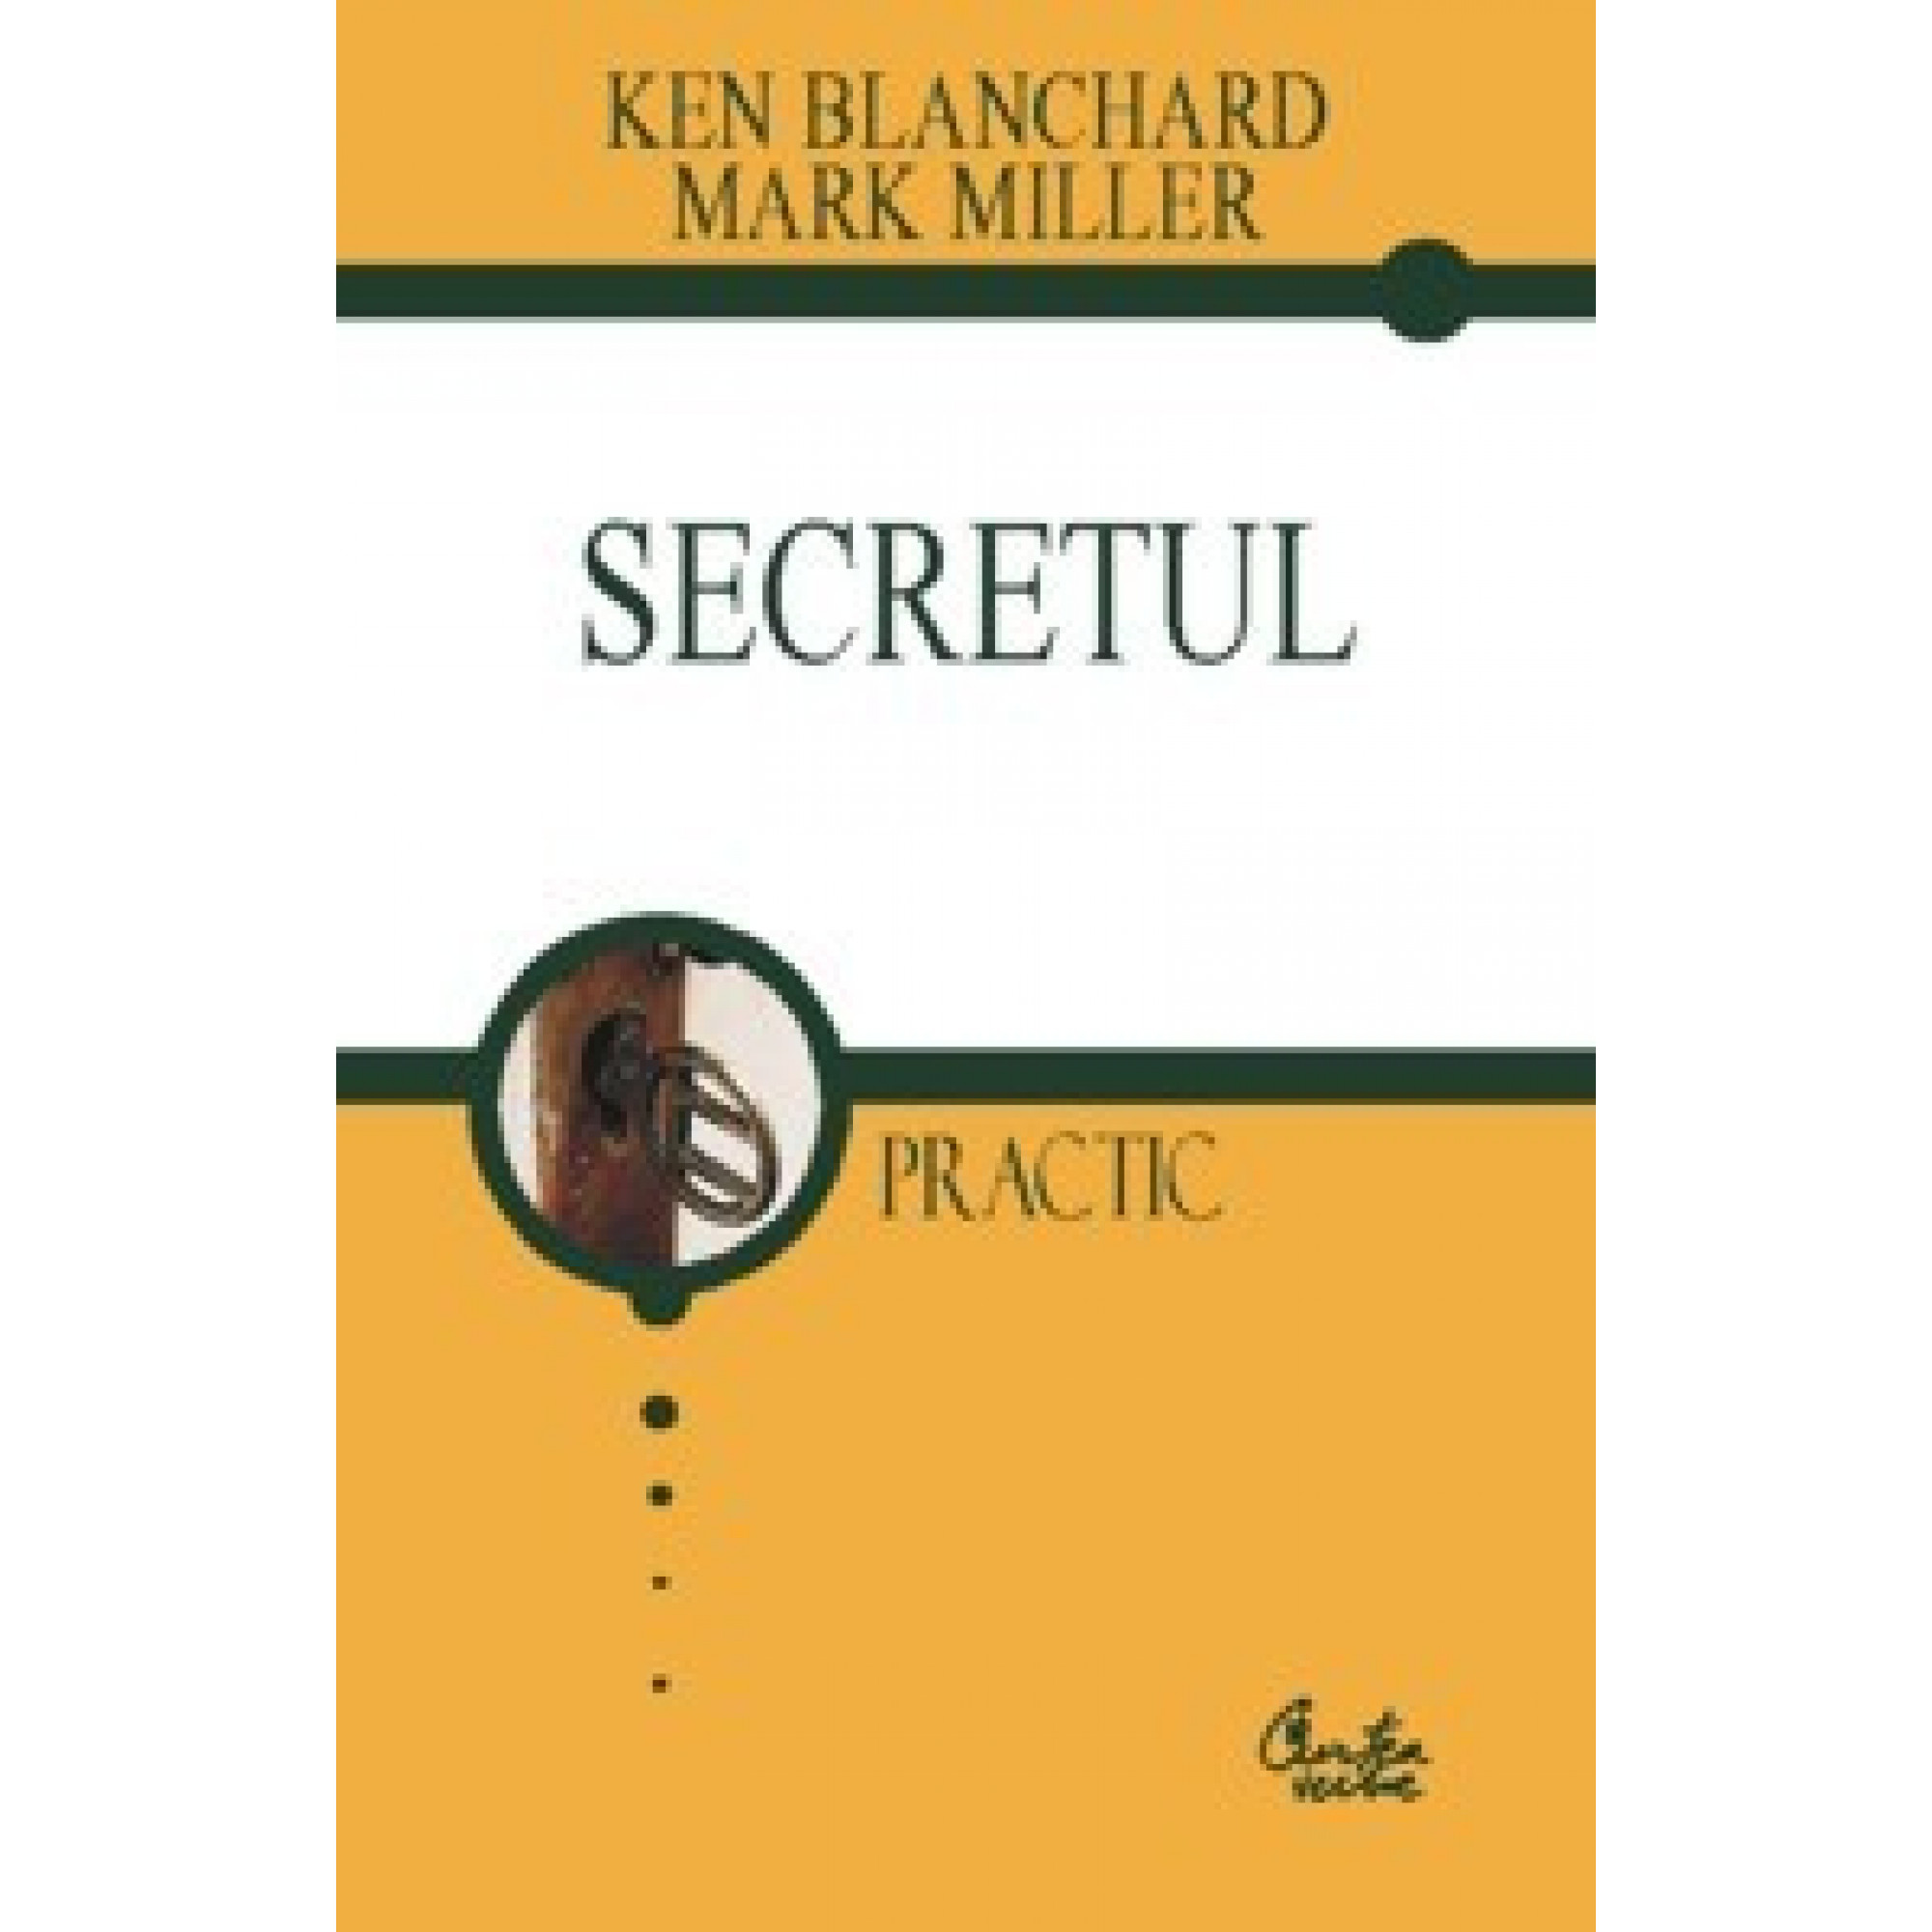 Secretul; Ken Blanchard, Mark Miller